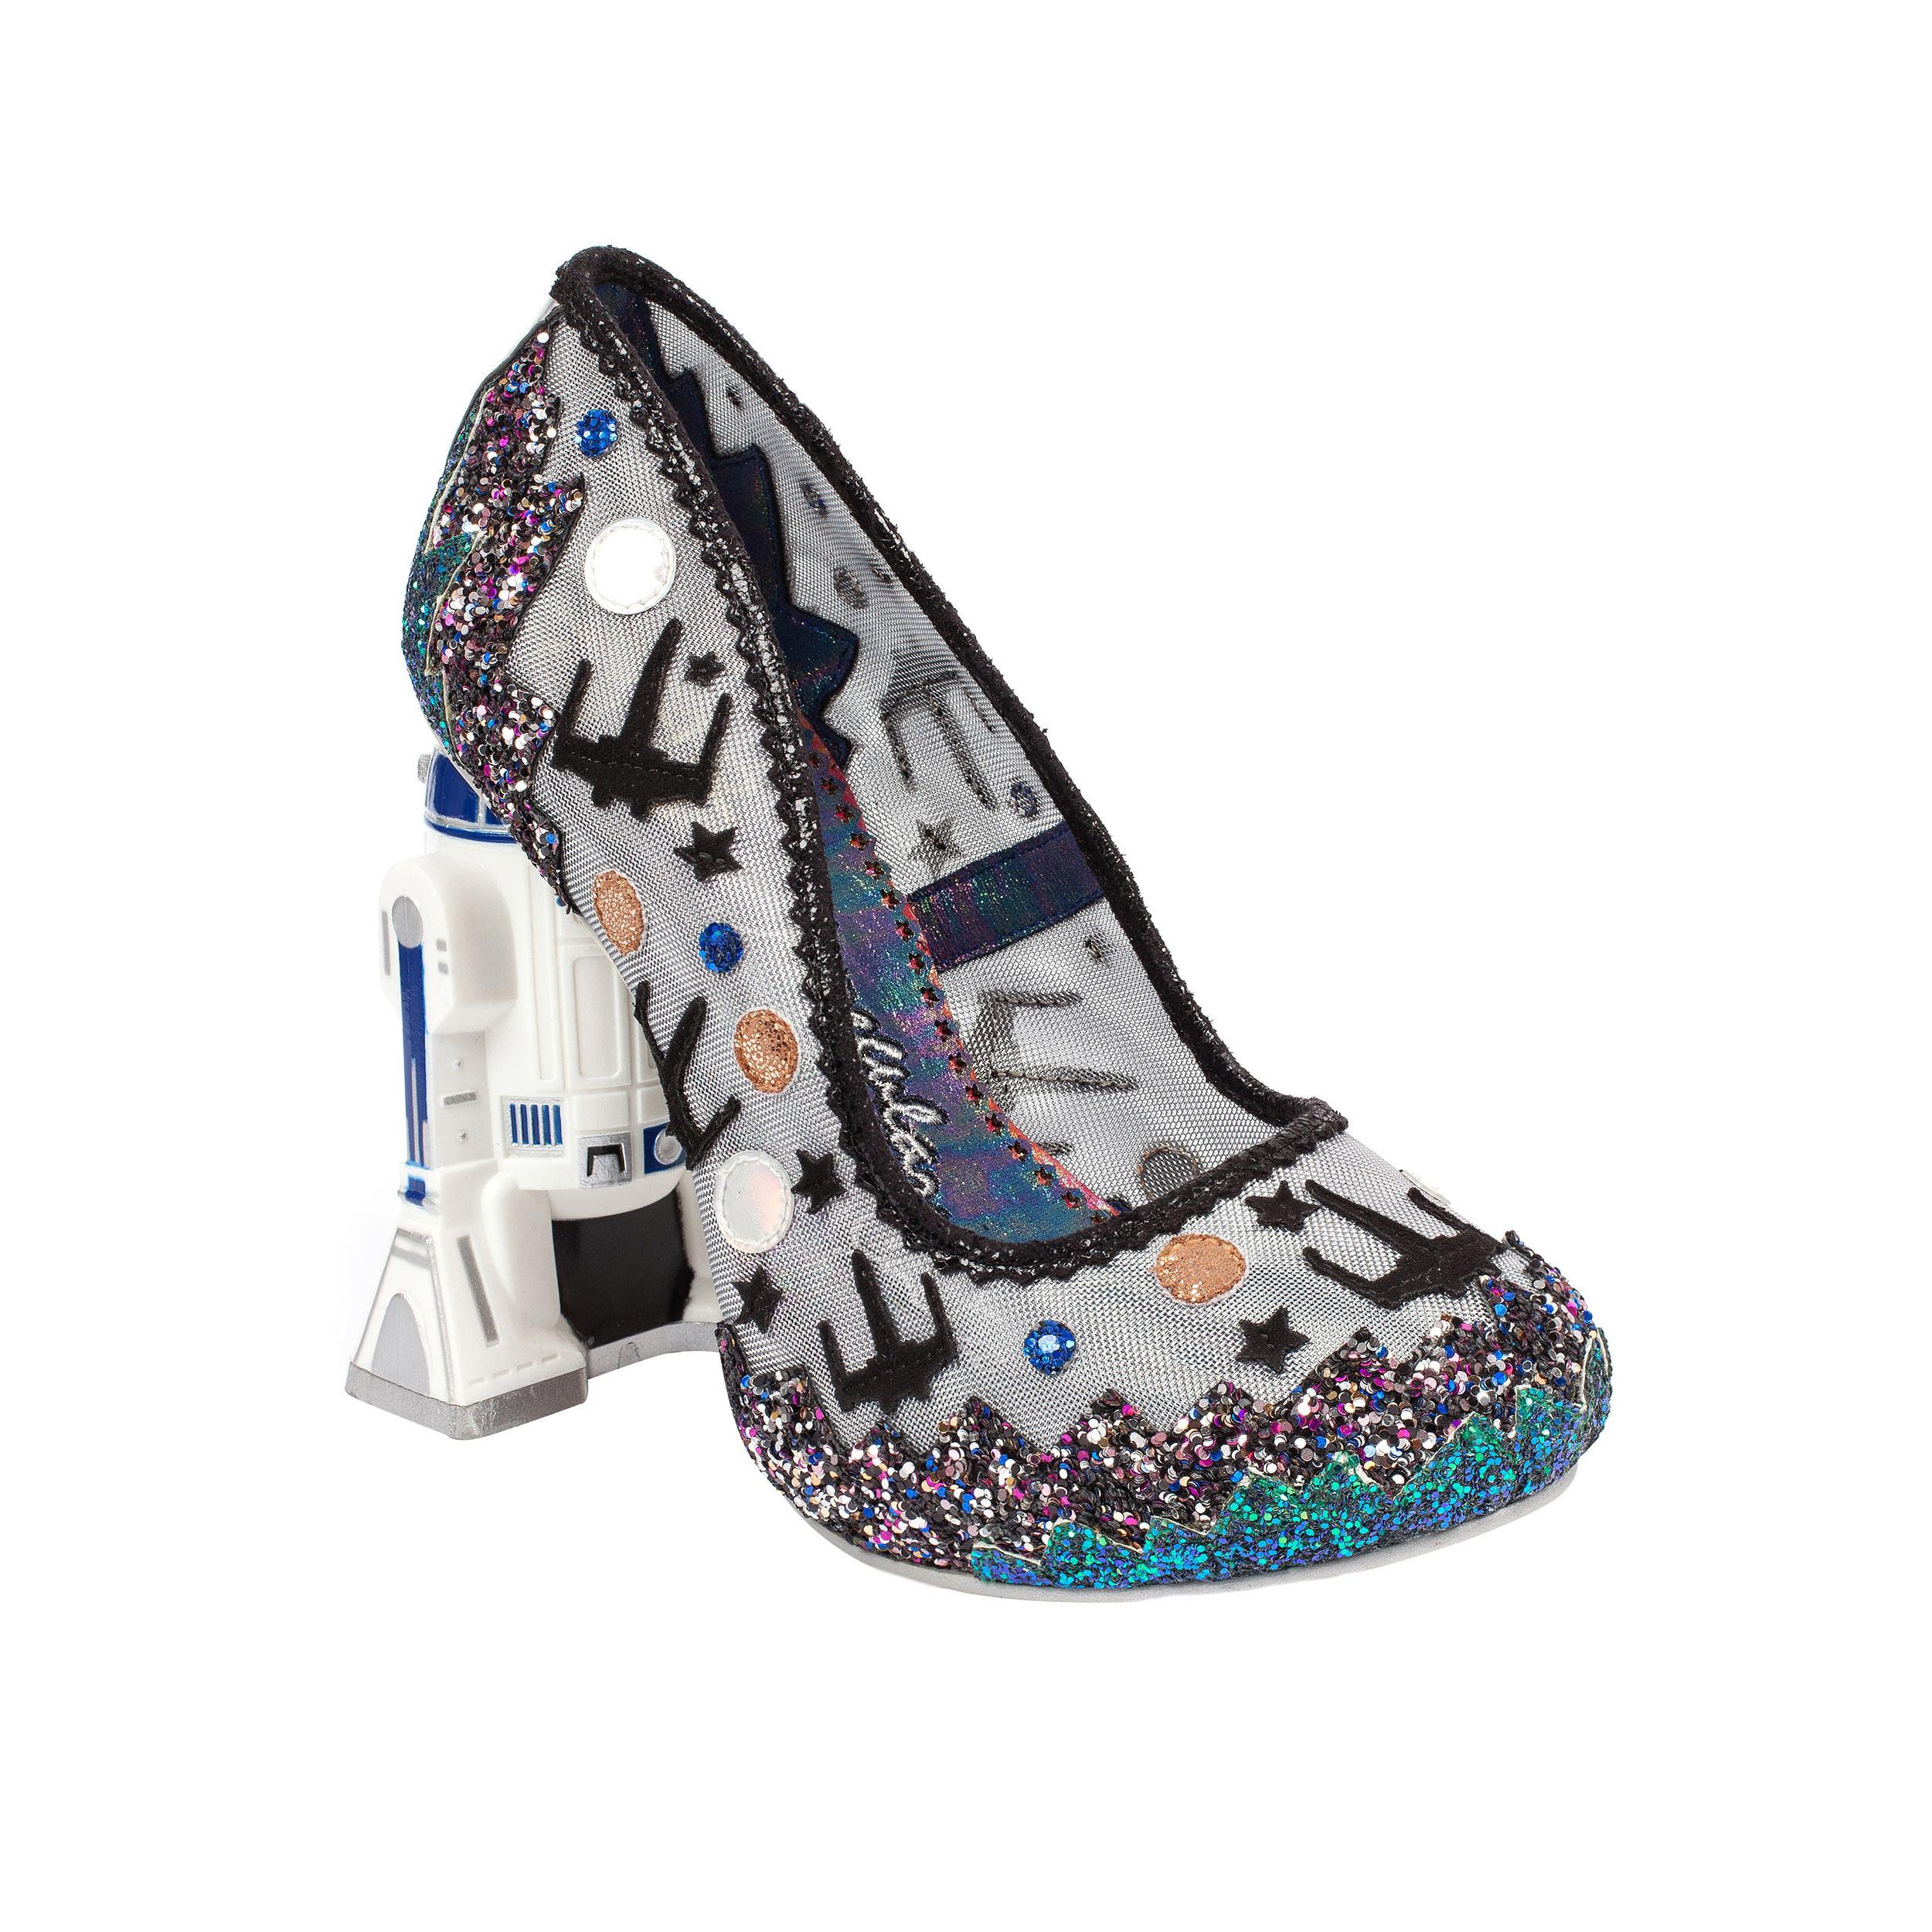 wholesale dealer 27bdf 89185 Star Wars Mesh Battlefront R2-D2 Women s Heels